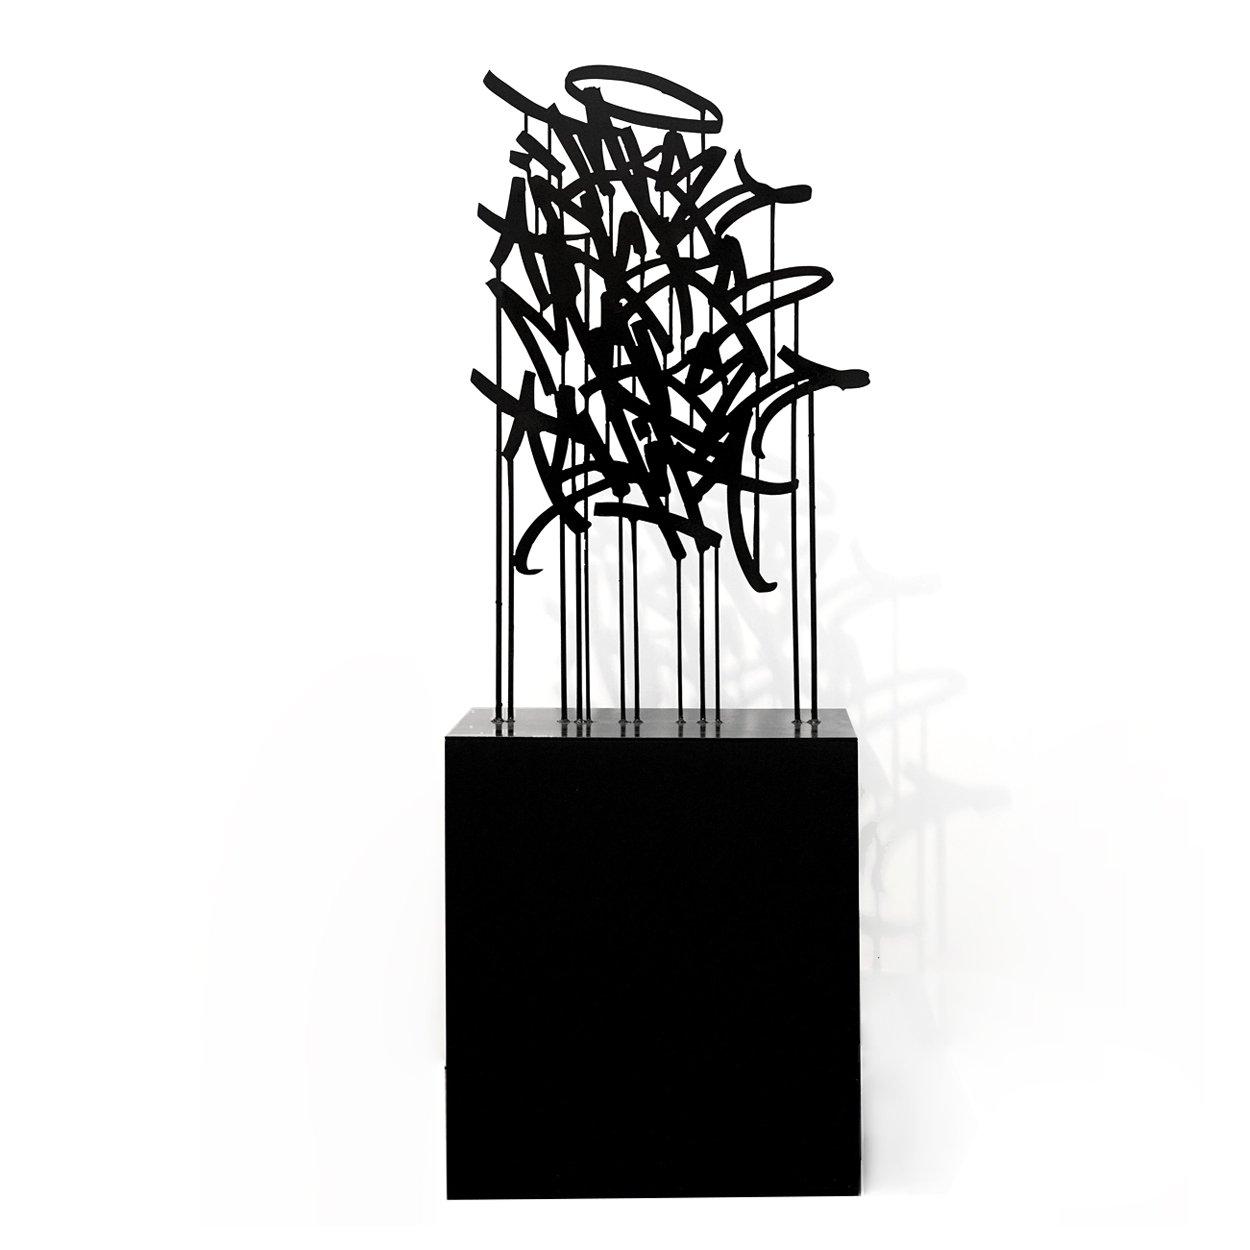 TILSITT GALLERY BISCO SMITH 190320_TAKERISKS-SteelSculpture-Main_Web_2048x2048